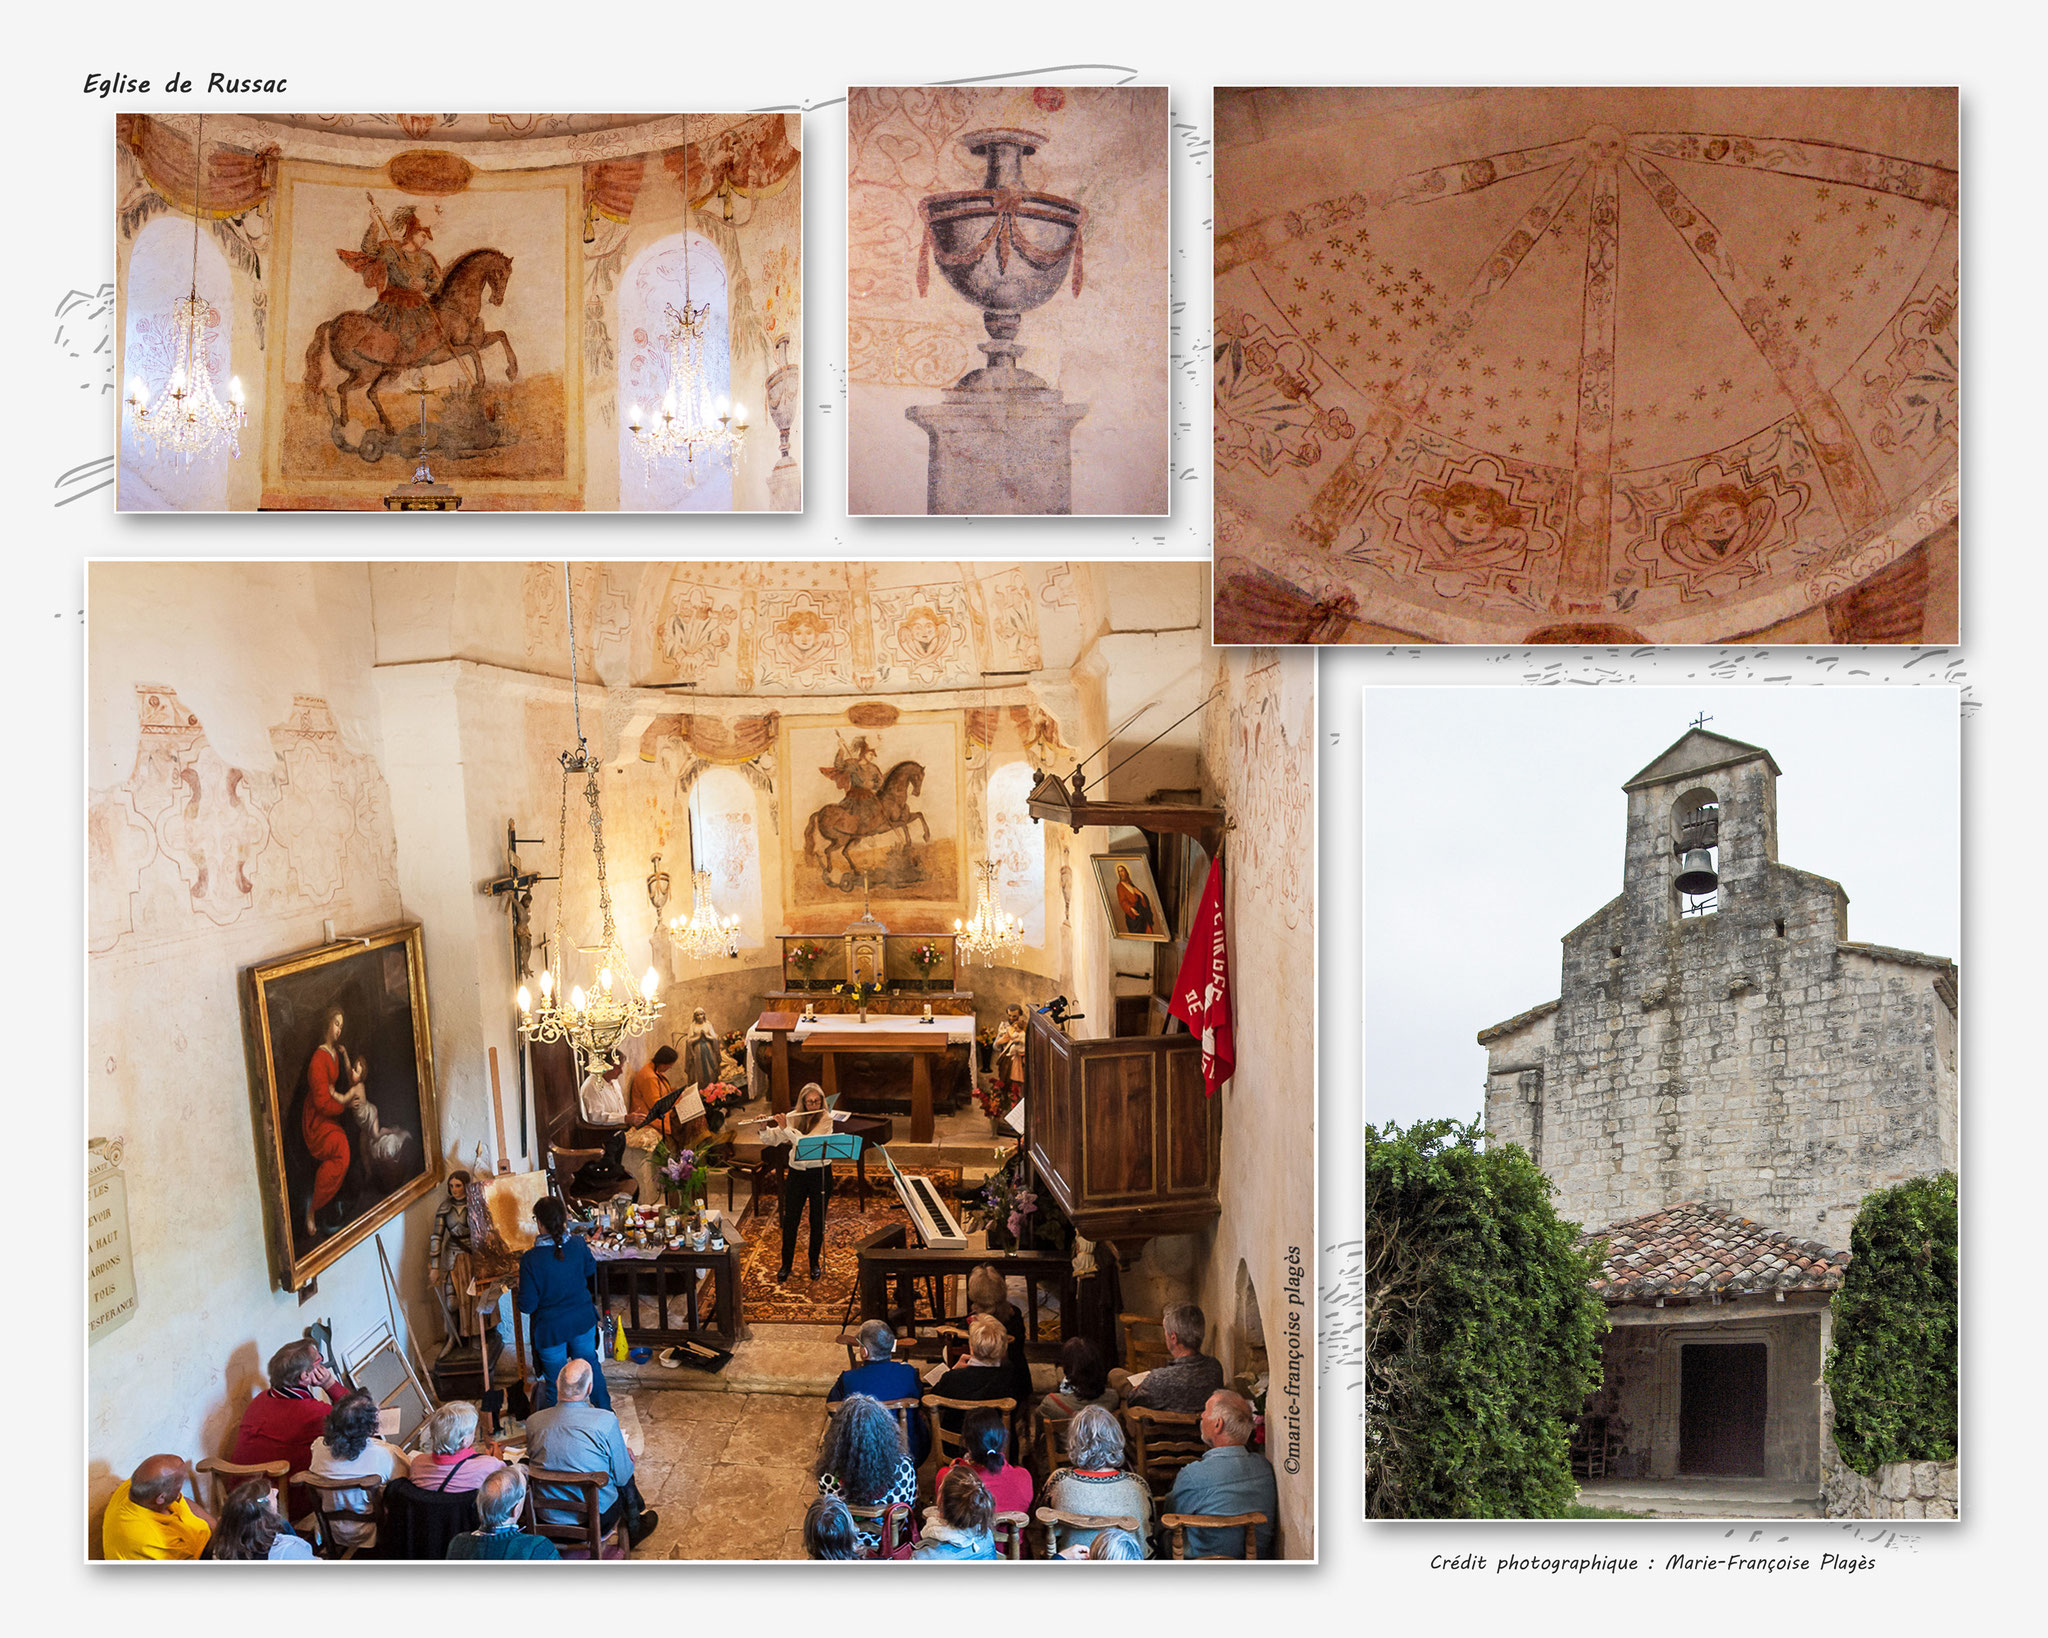 Eglise de Russac